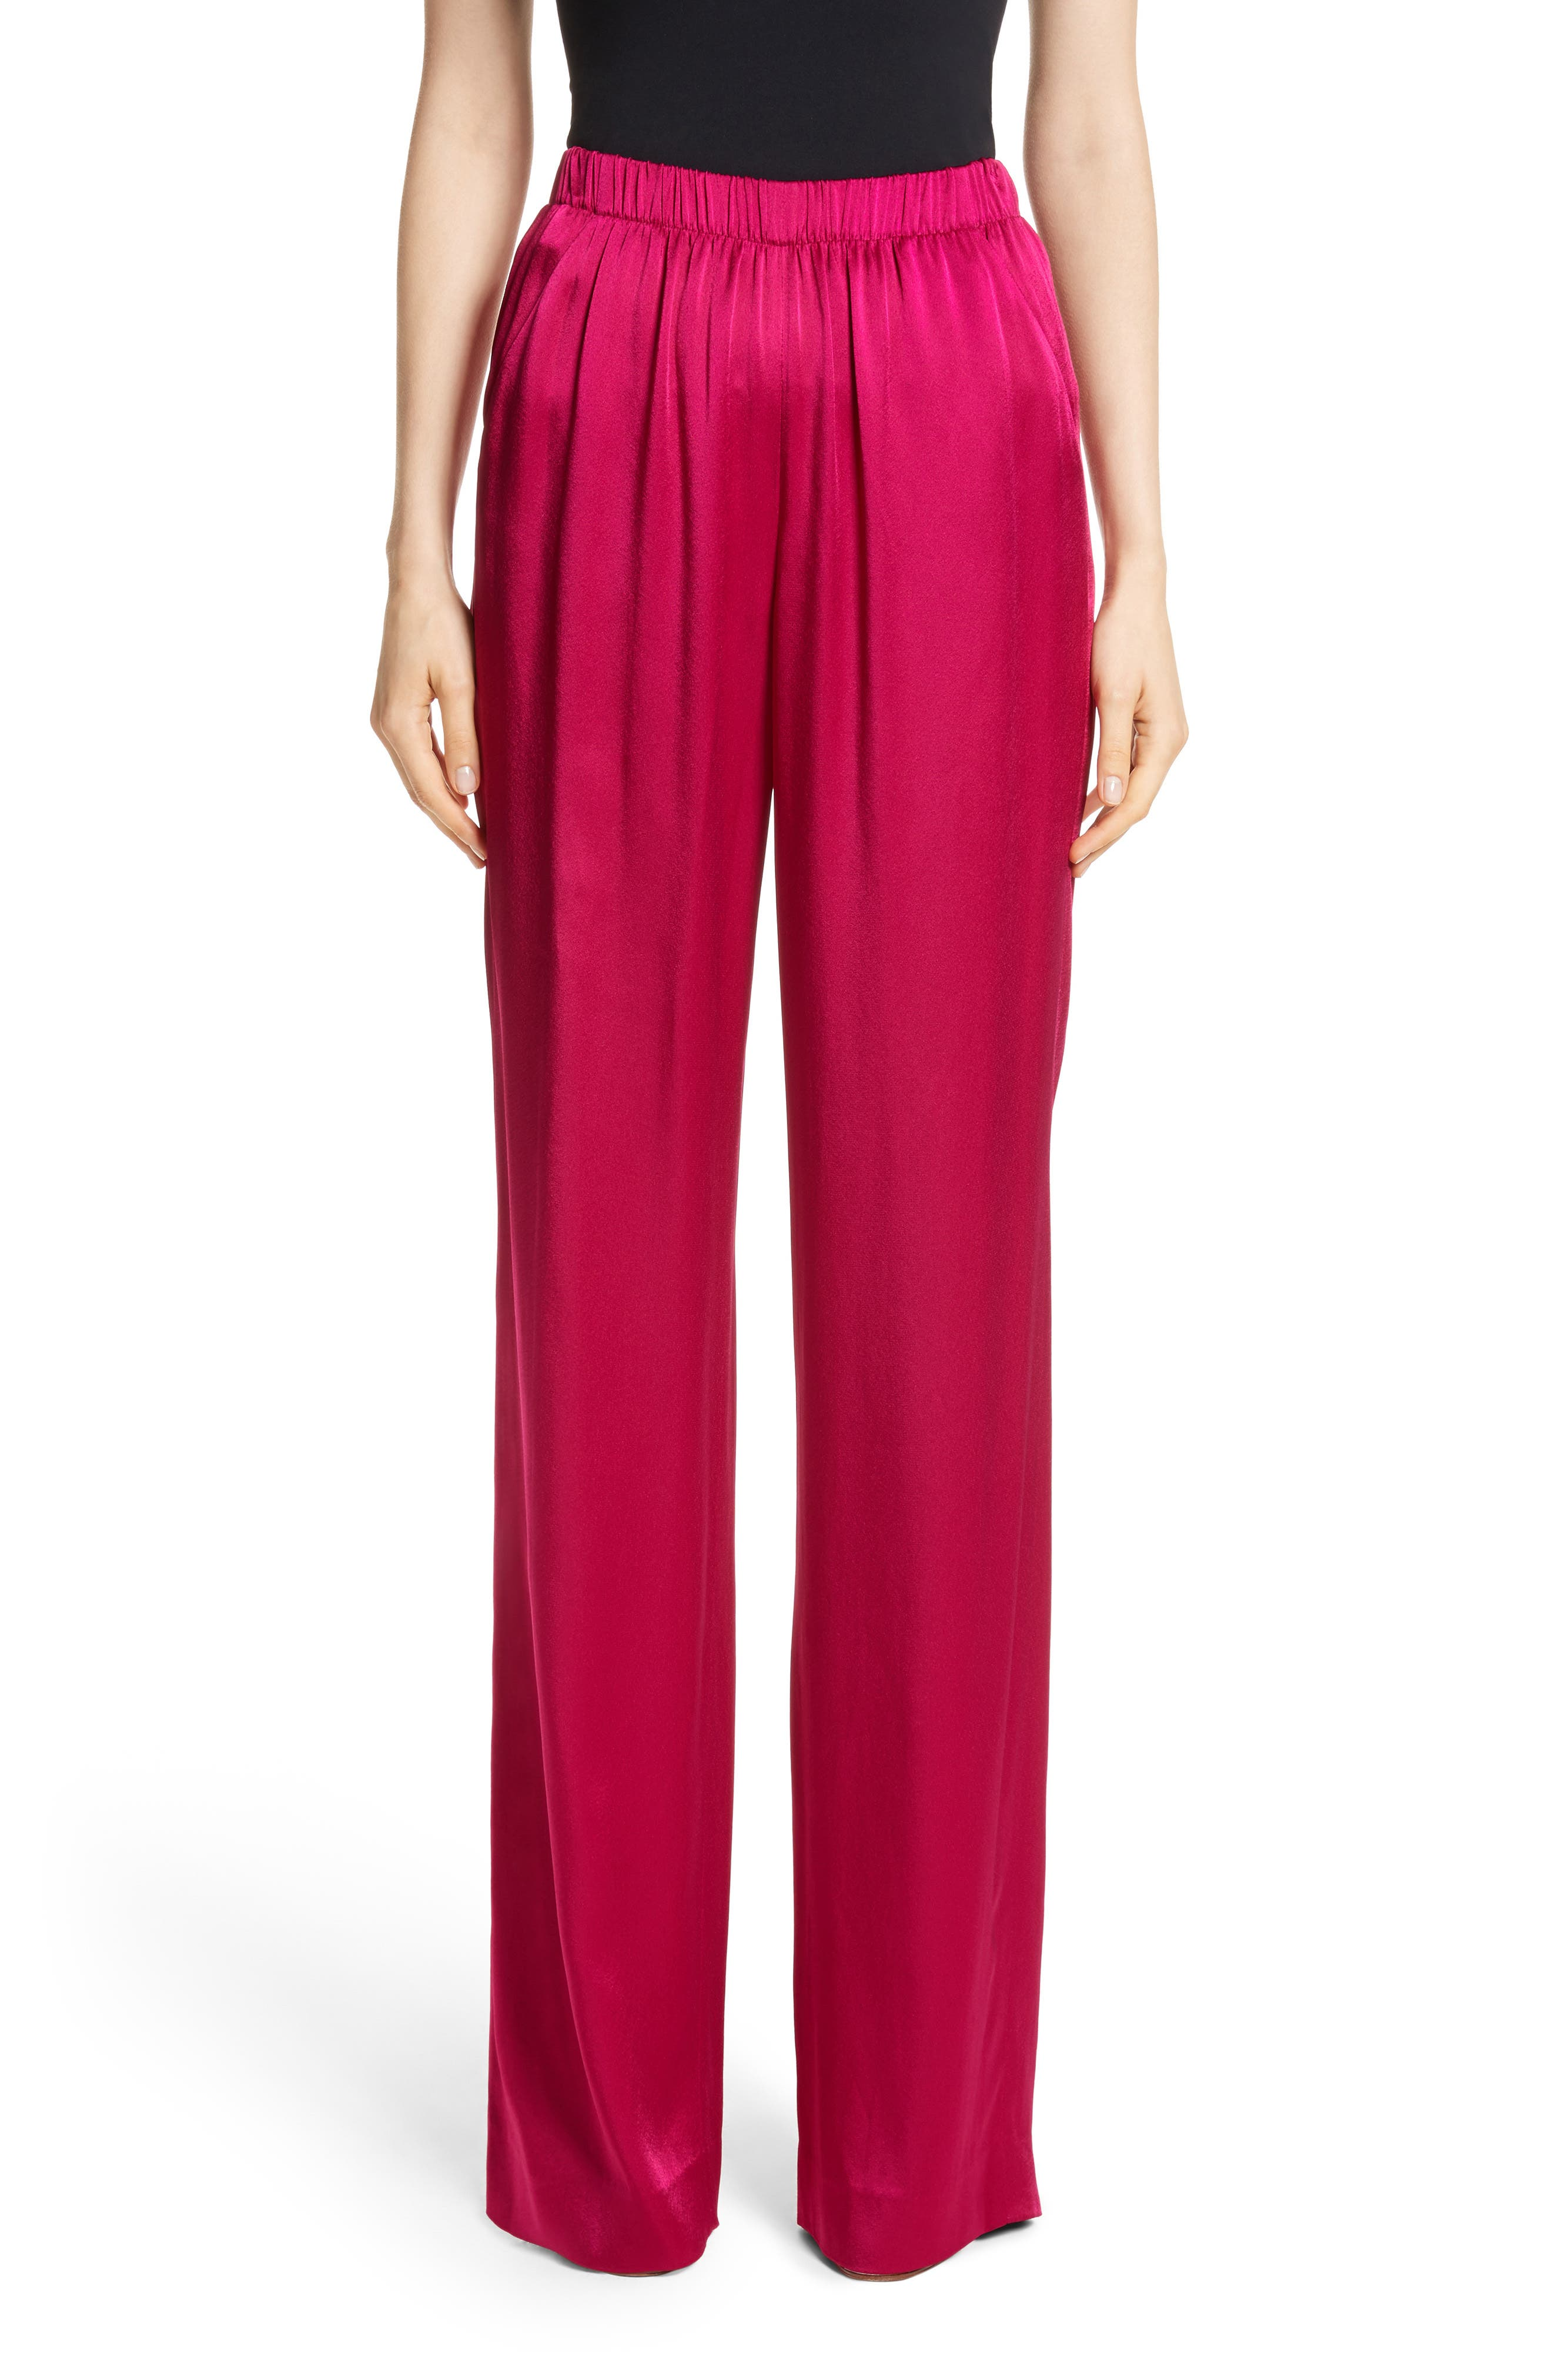 Liquid Crepe Pants,                         Main,                         color, 600